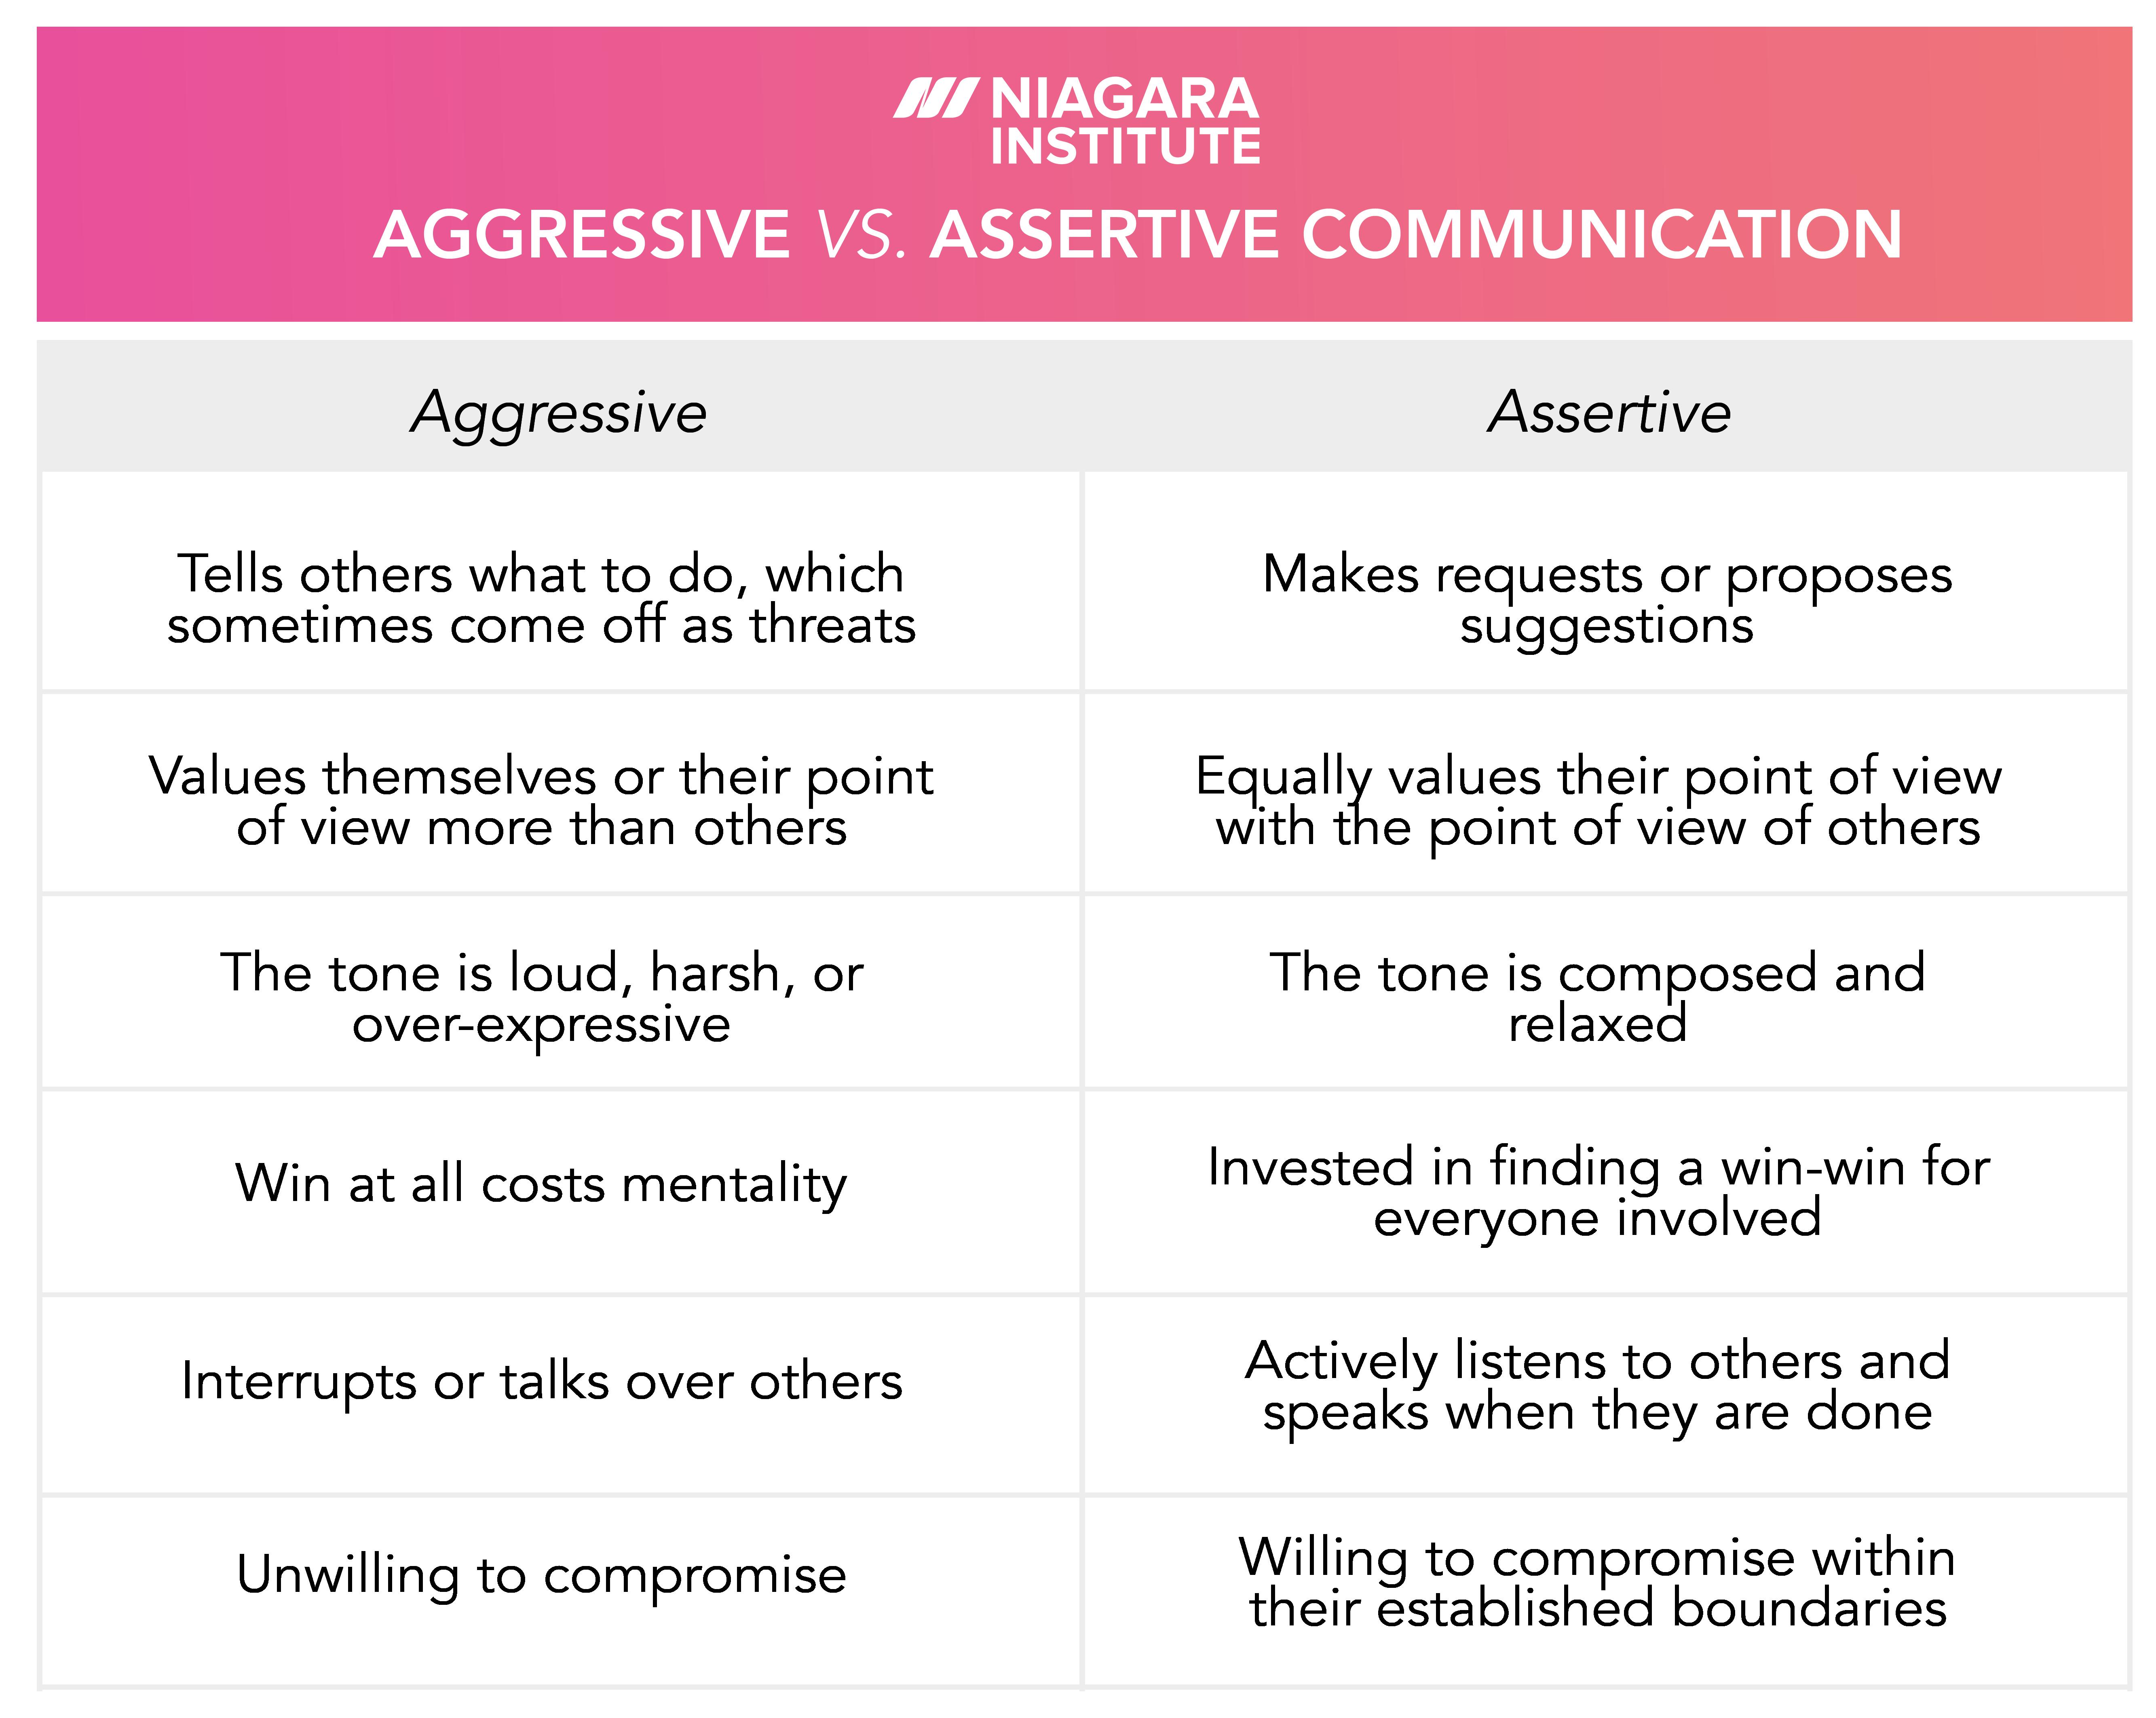 Aggressive vs Assertive Communication Styles